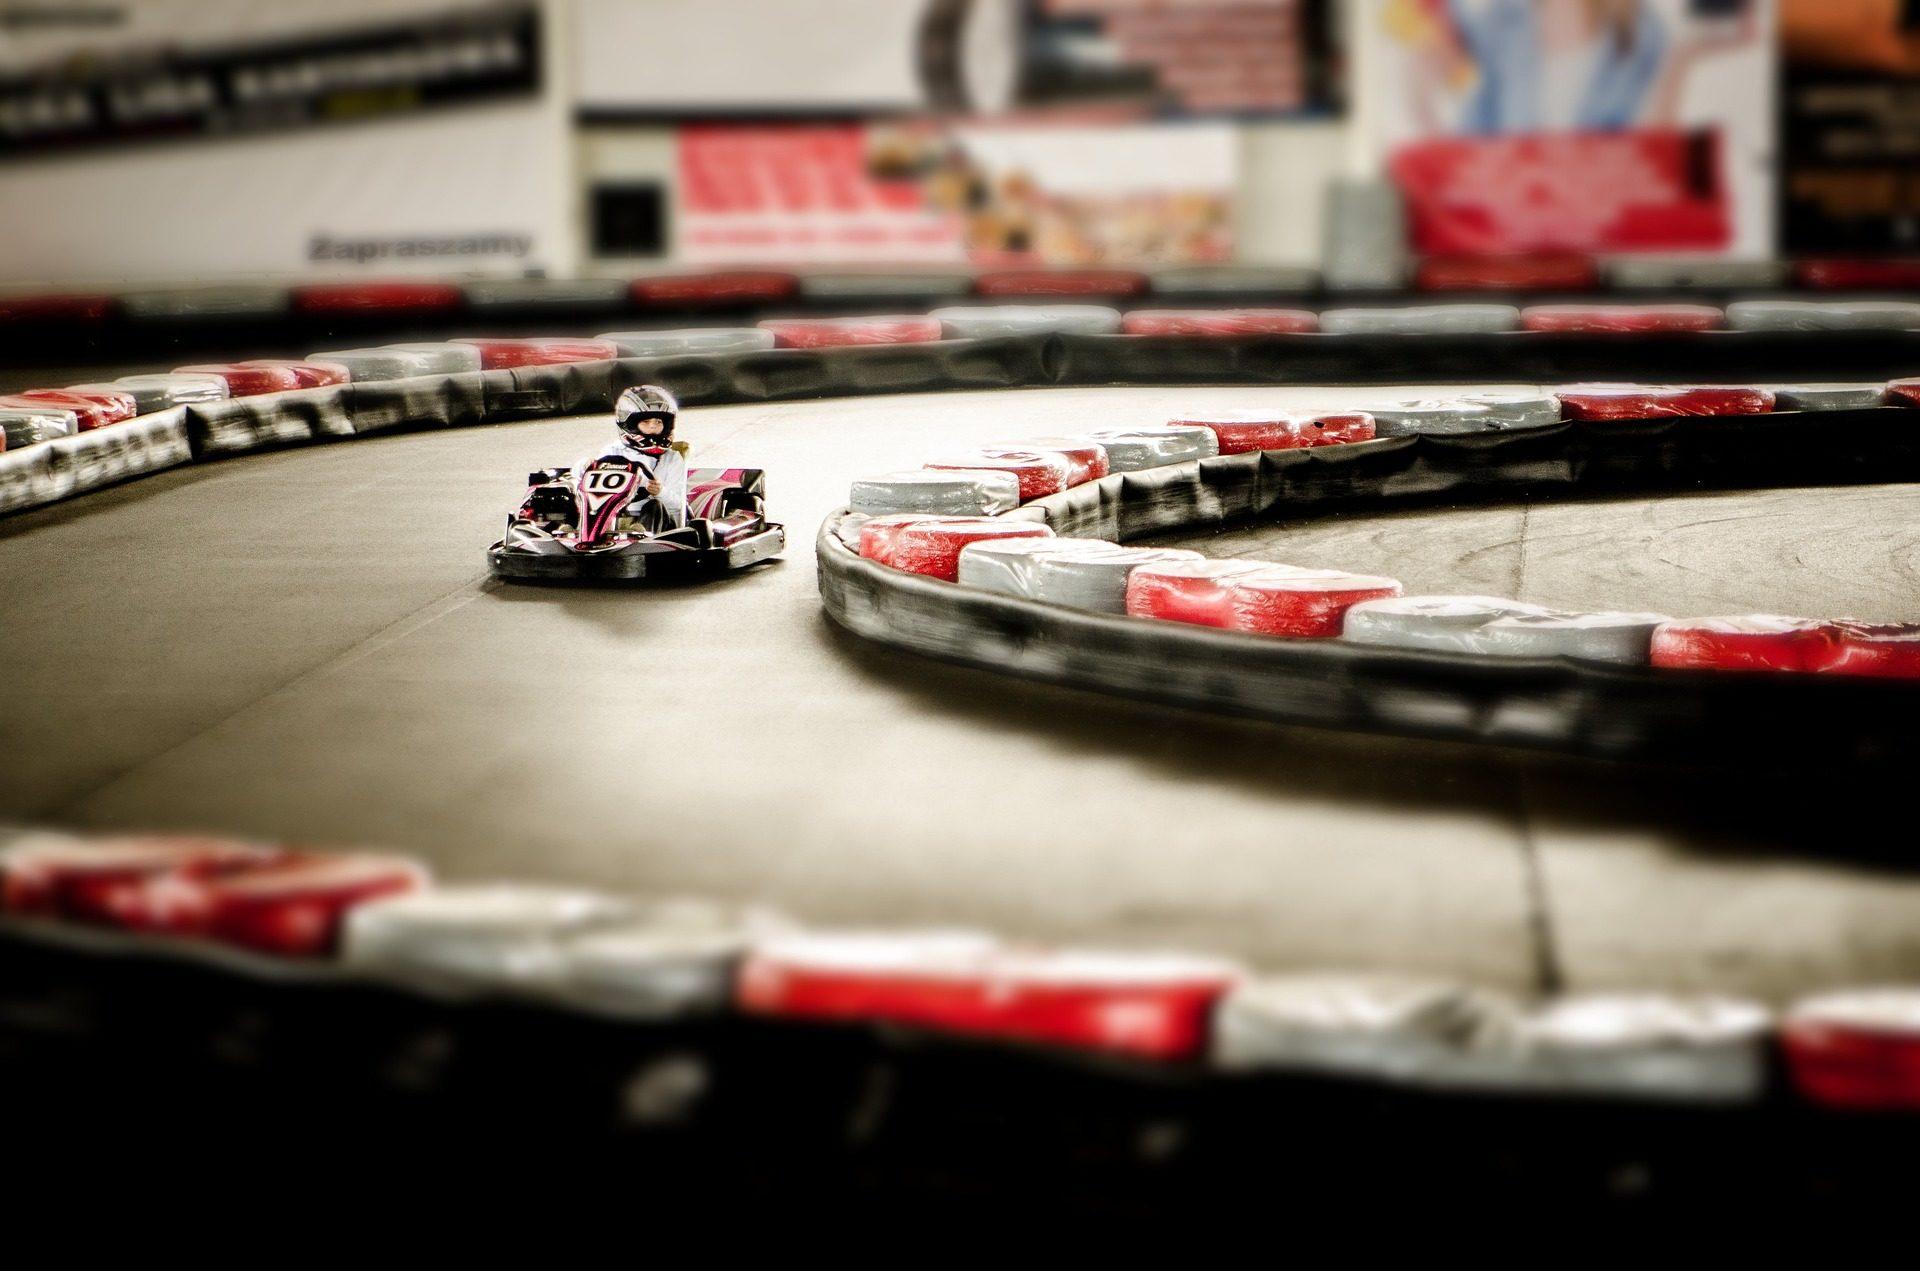 karts, voitures, Racing, concours, amusement - Fonds d'écran HD - Professor-falken.com